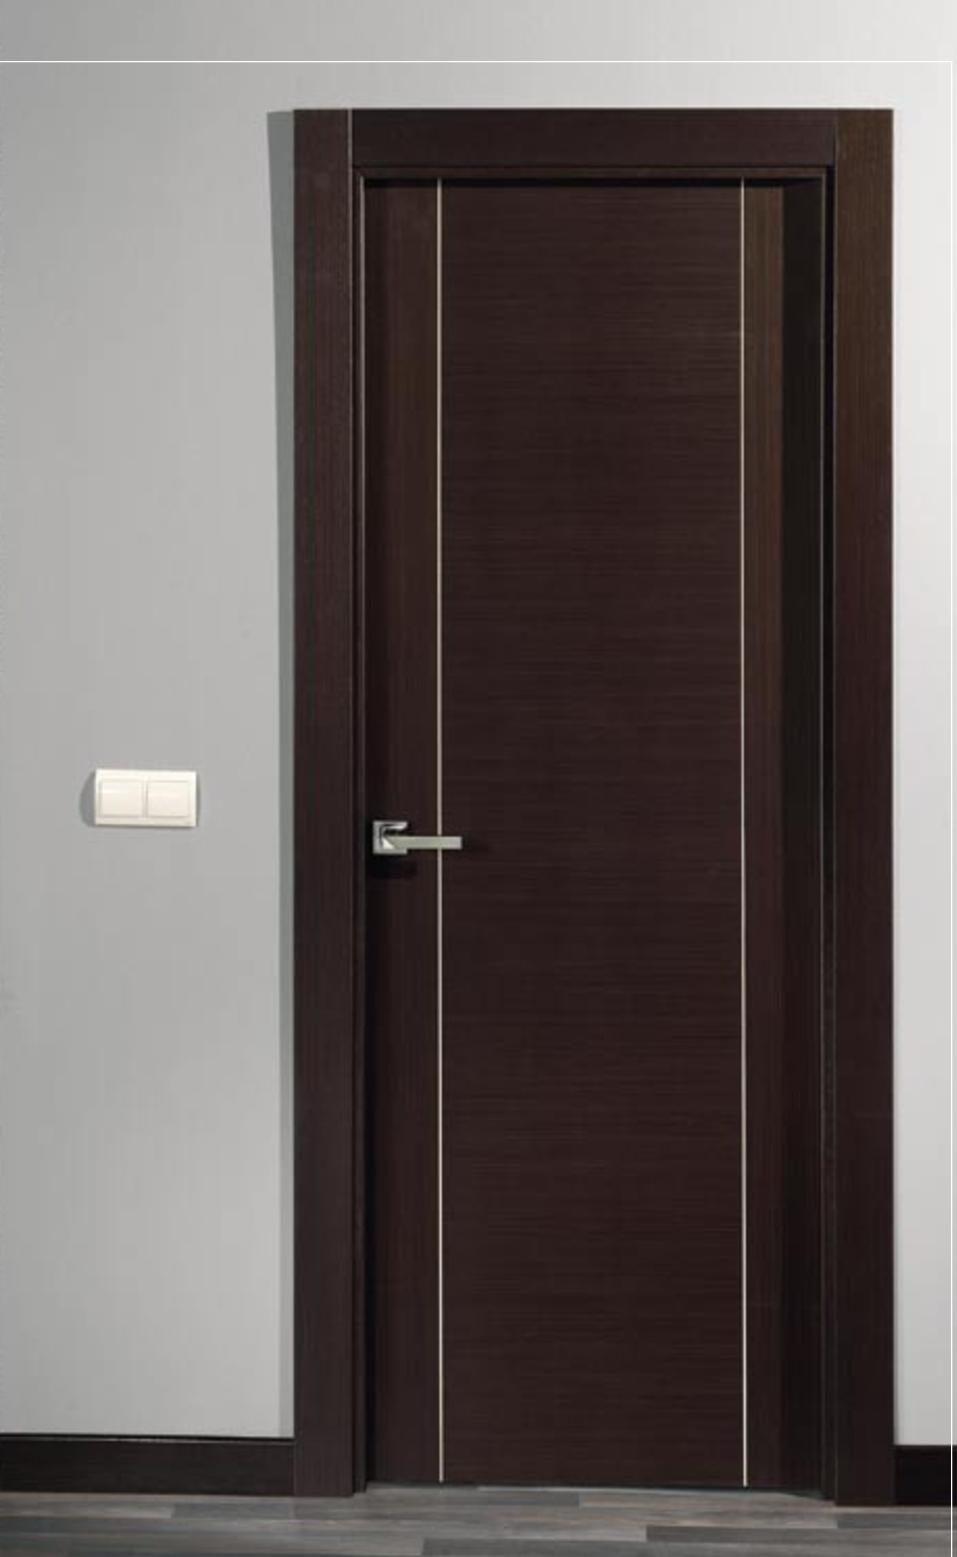 Artisan servicios servicios que ofrecemos for Puertas de dormitorios en madera